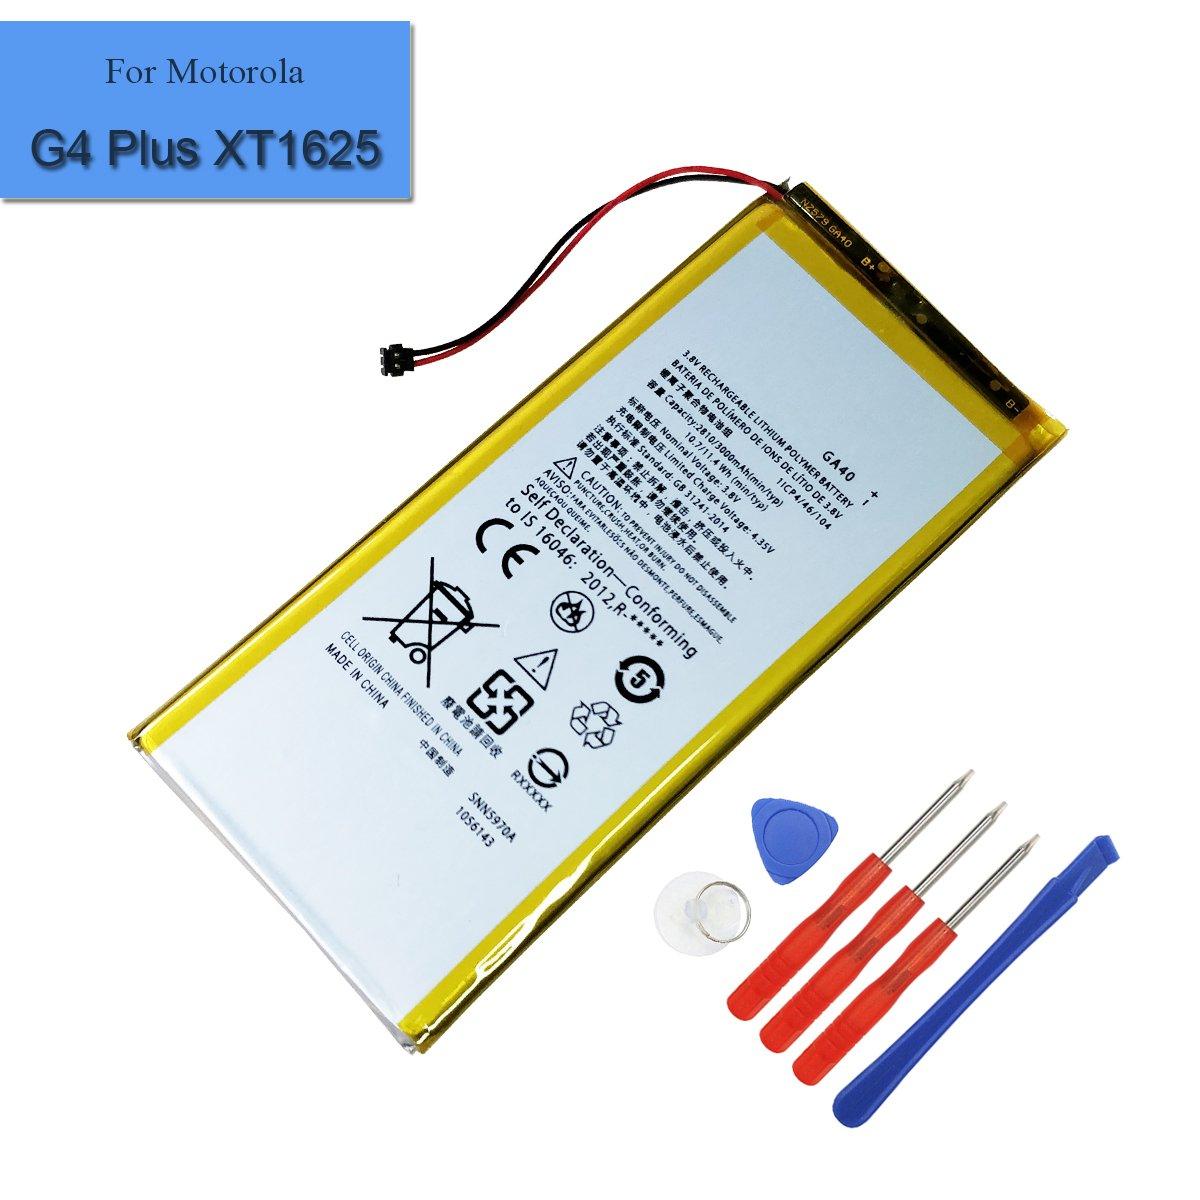 Bateria Celular para MOTOROLA G4 Plus XT1625 XT1643 XT1644 2810mAh 3.8V GA40 SNN5970A con Herramientas